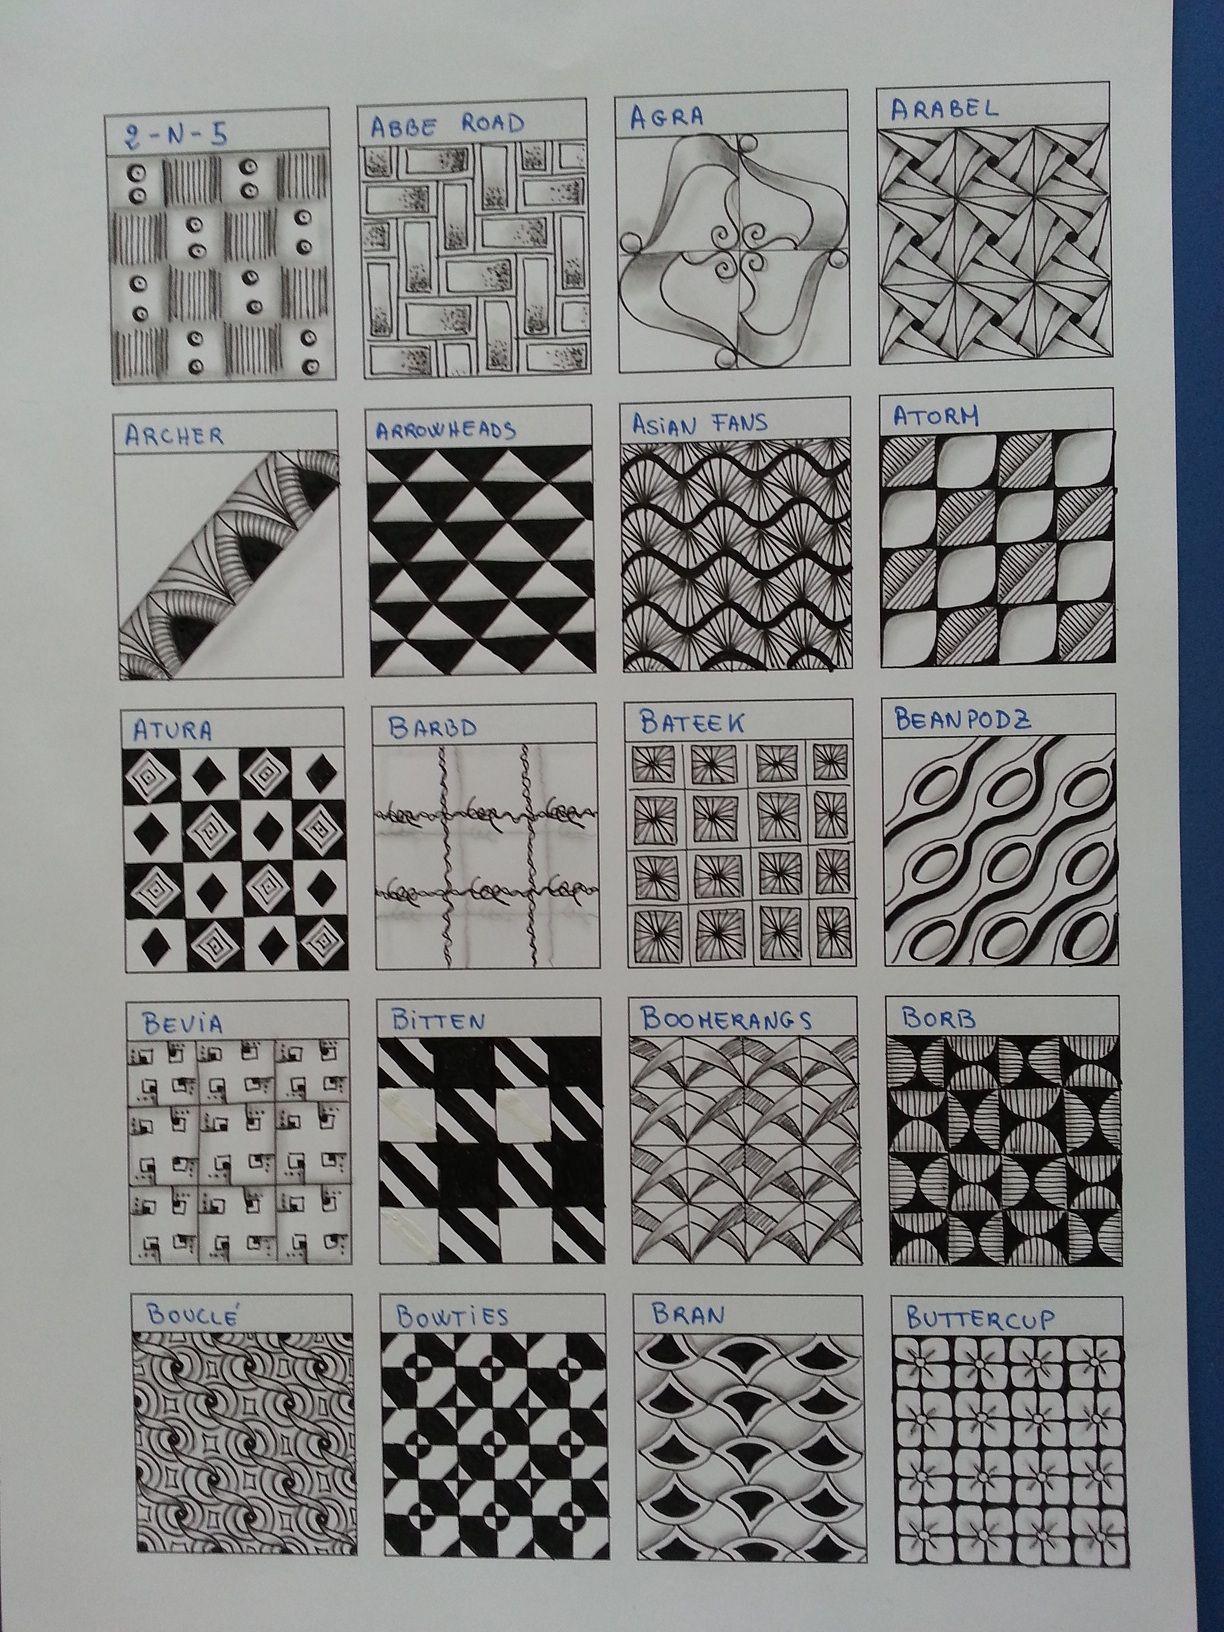 zentangle patterns on pinterest tangle patterns zentangle patterns. Black Bedroom Furniture Sets. Home Design Ideas